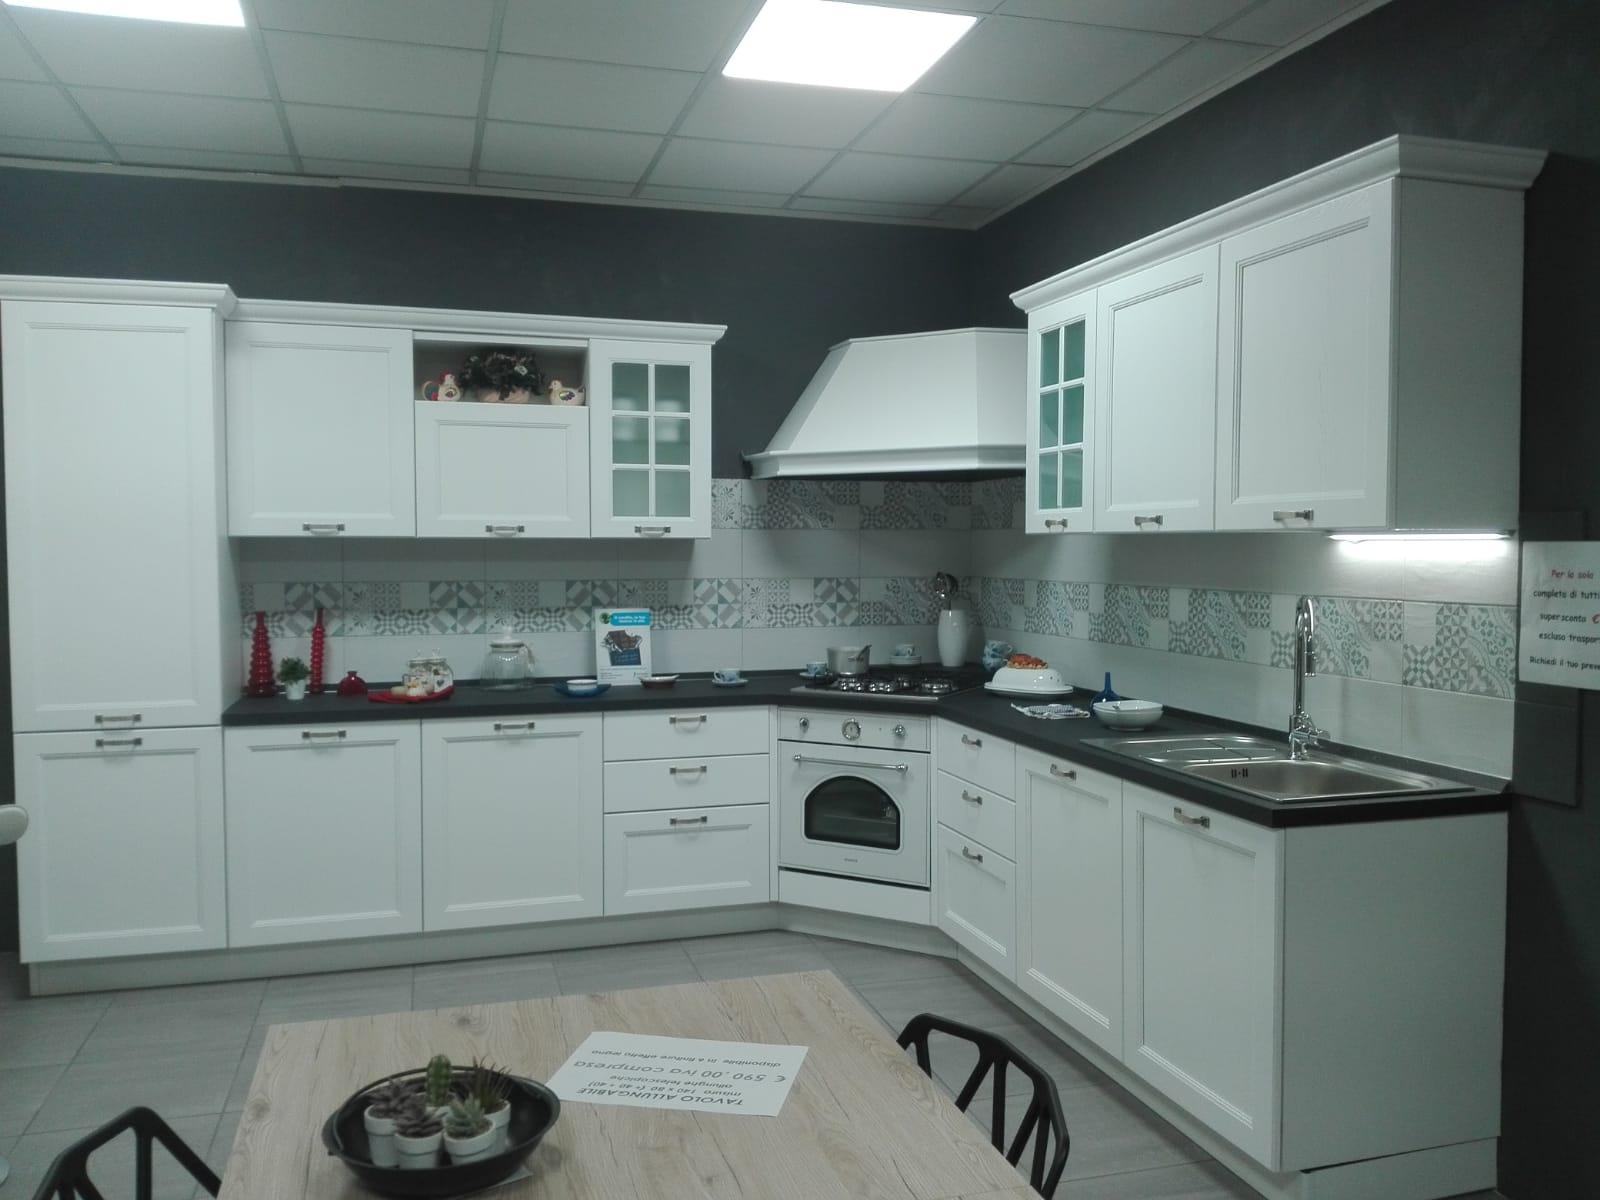 Beautiful Cucina Angolare Offerta Ideas - Comads897.com ...